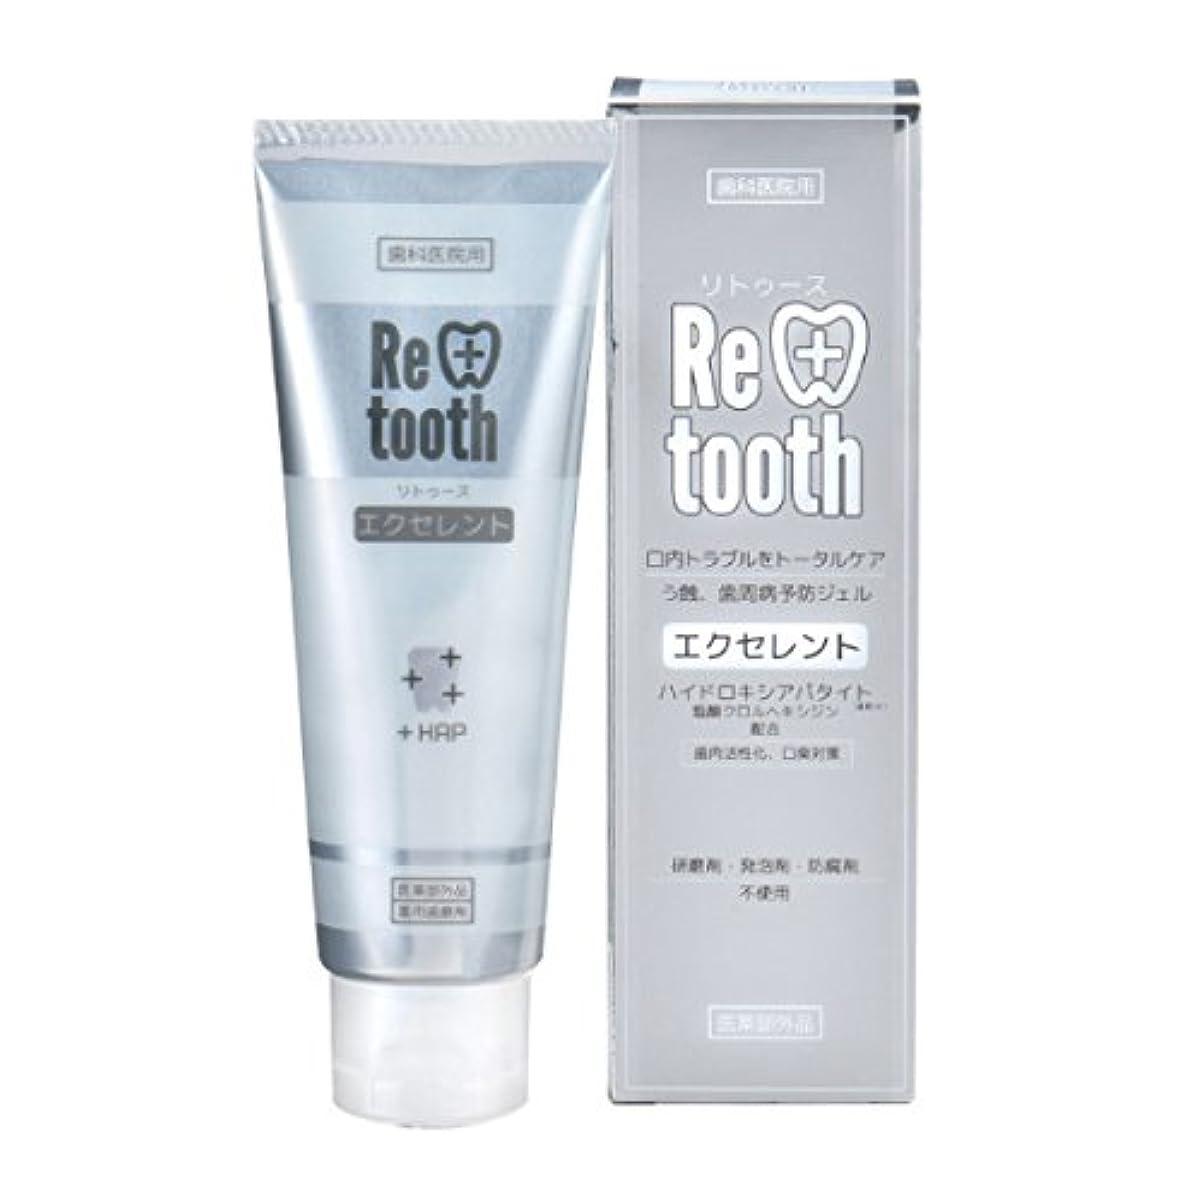 Retooth(リトゥース) 歯科医が監修した歯磨きジェル エクセレント 75g【医薬部外品】